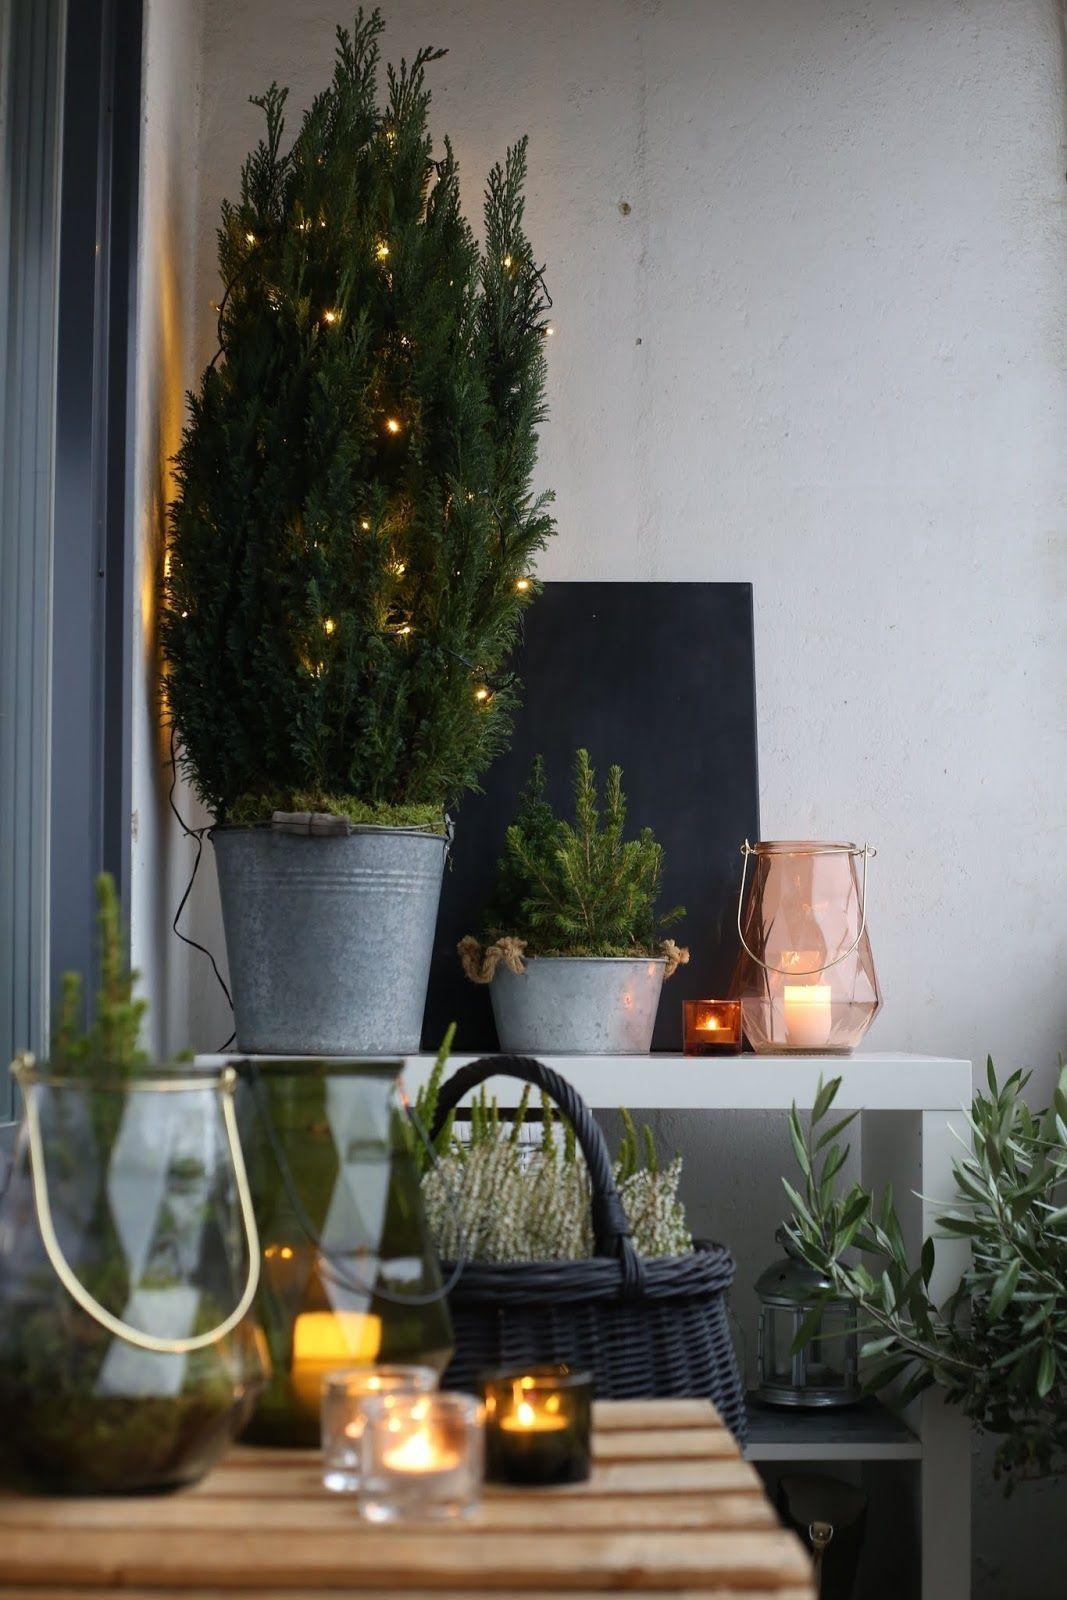 30 small apartment balcony for christmas decor parveke sisustus jouluvalot pienen asunnon on christmas balcony decorations apartment patio id=53572